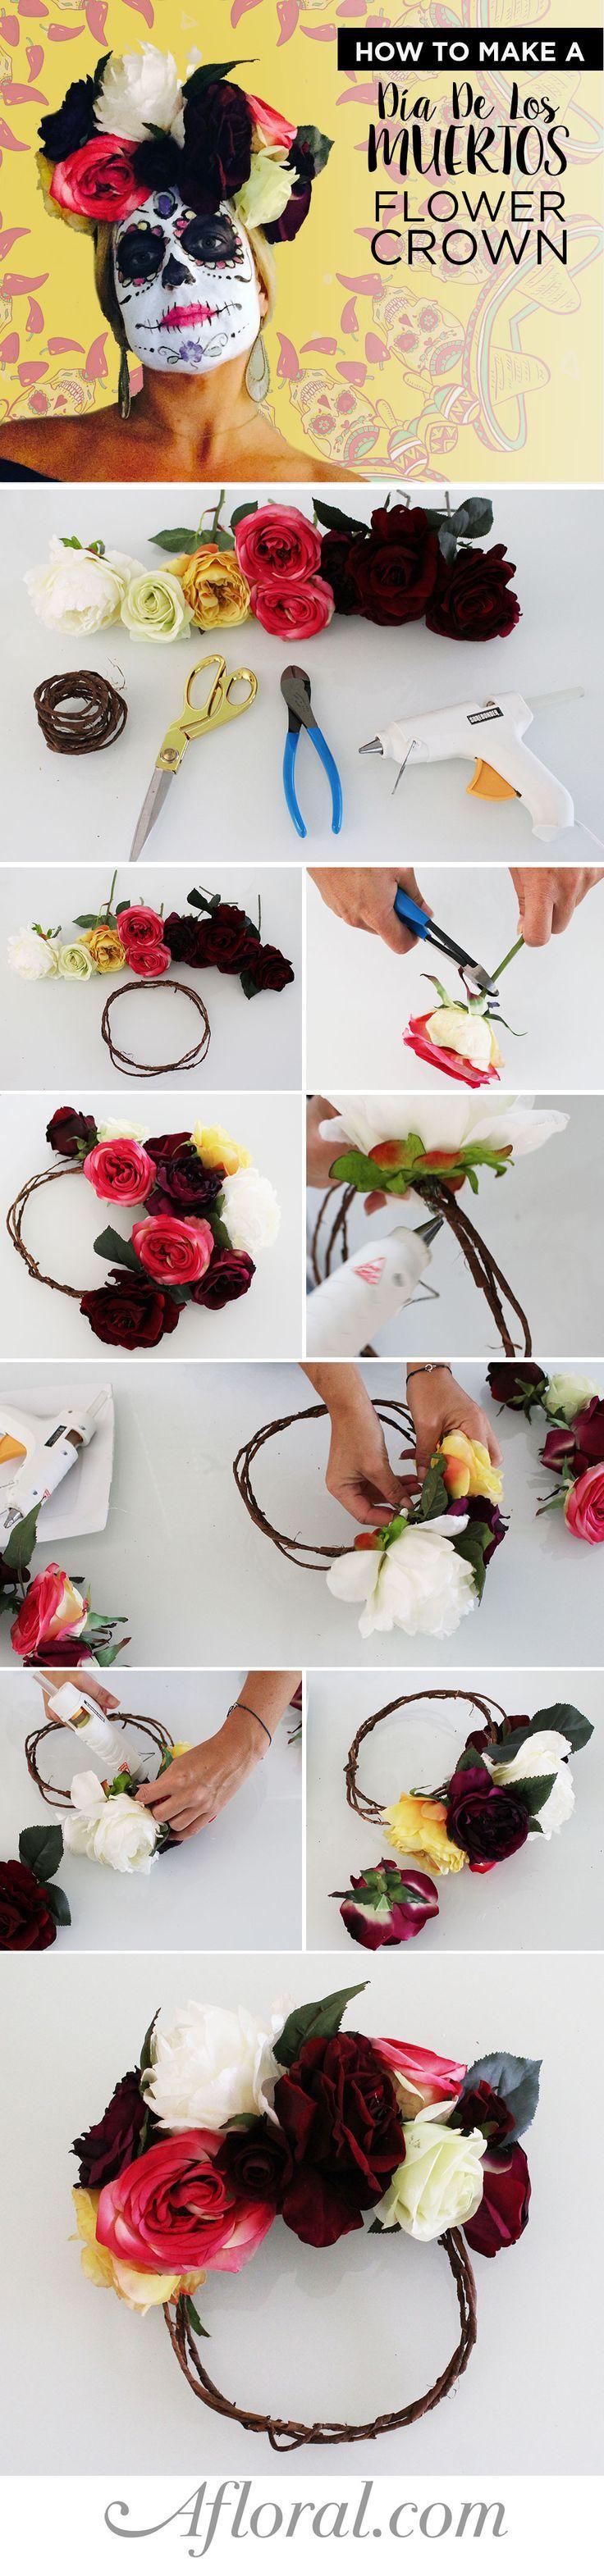 How to make a flower crown floral crown dia de and halloween costumes how to make a flower crown izmirmasajfo